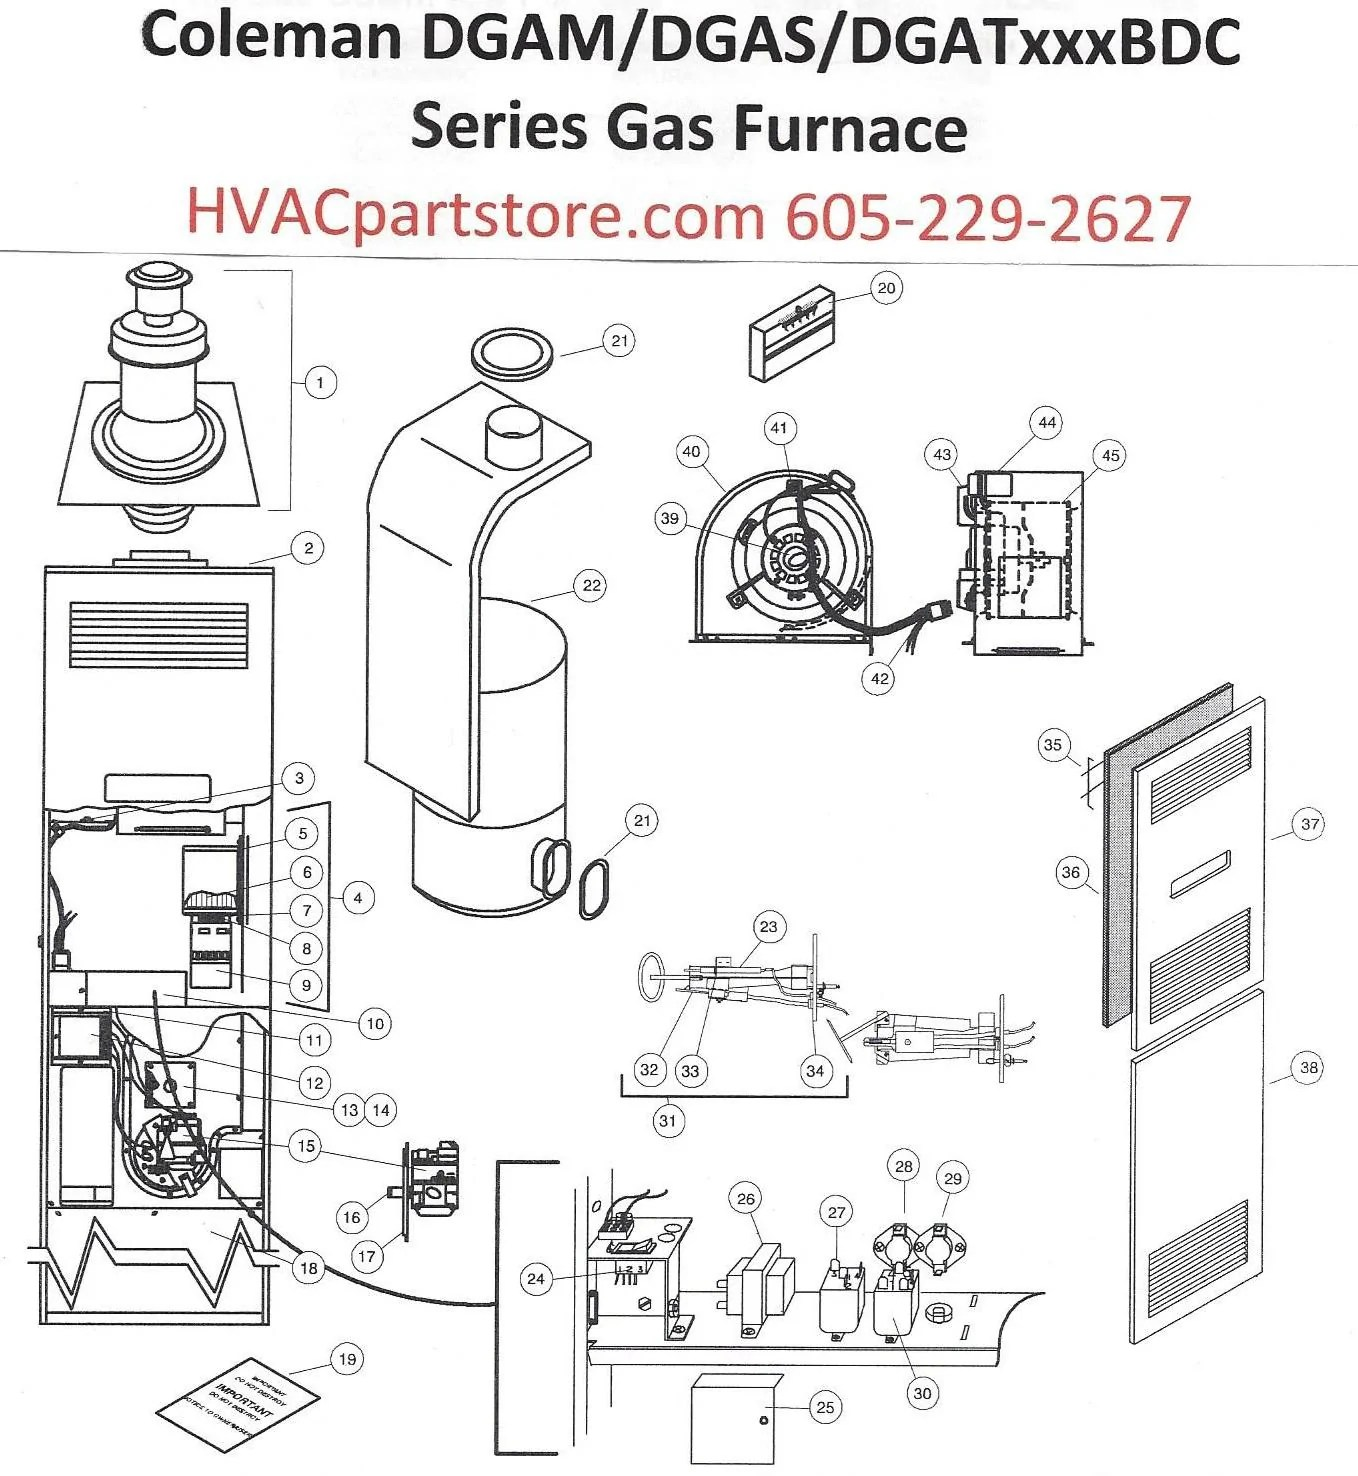 lennox gas furnace wiring diagram prepaid electric meter dgat075bdd coleman parts – hvacpartstore